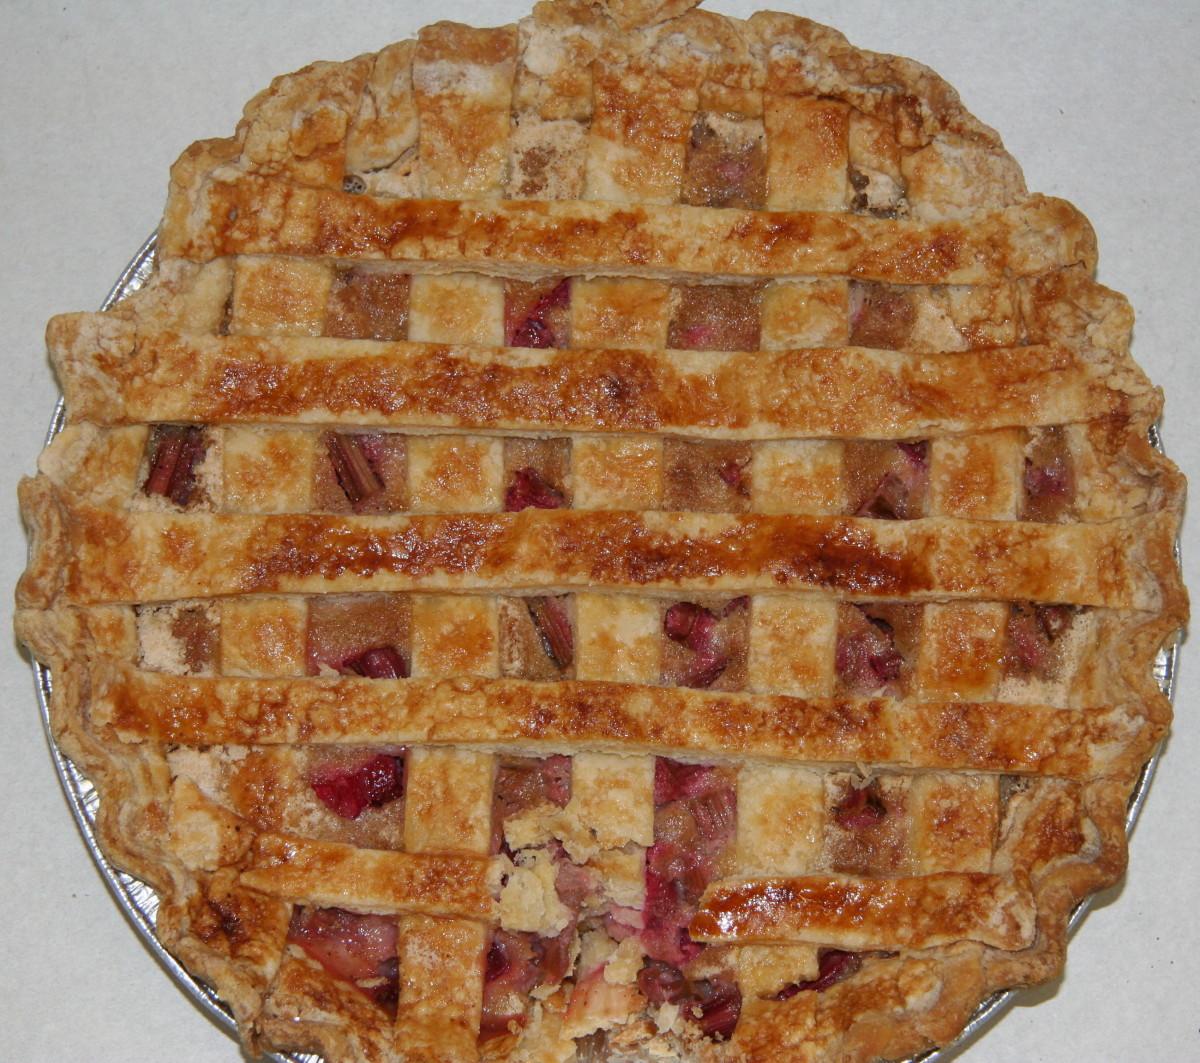 The Best Rhubarb Pie Recipe - Rhubarb Cream Pie